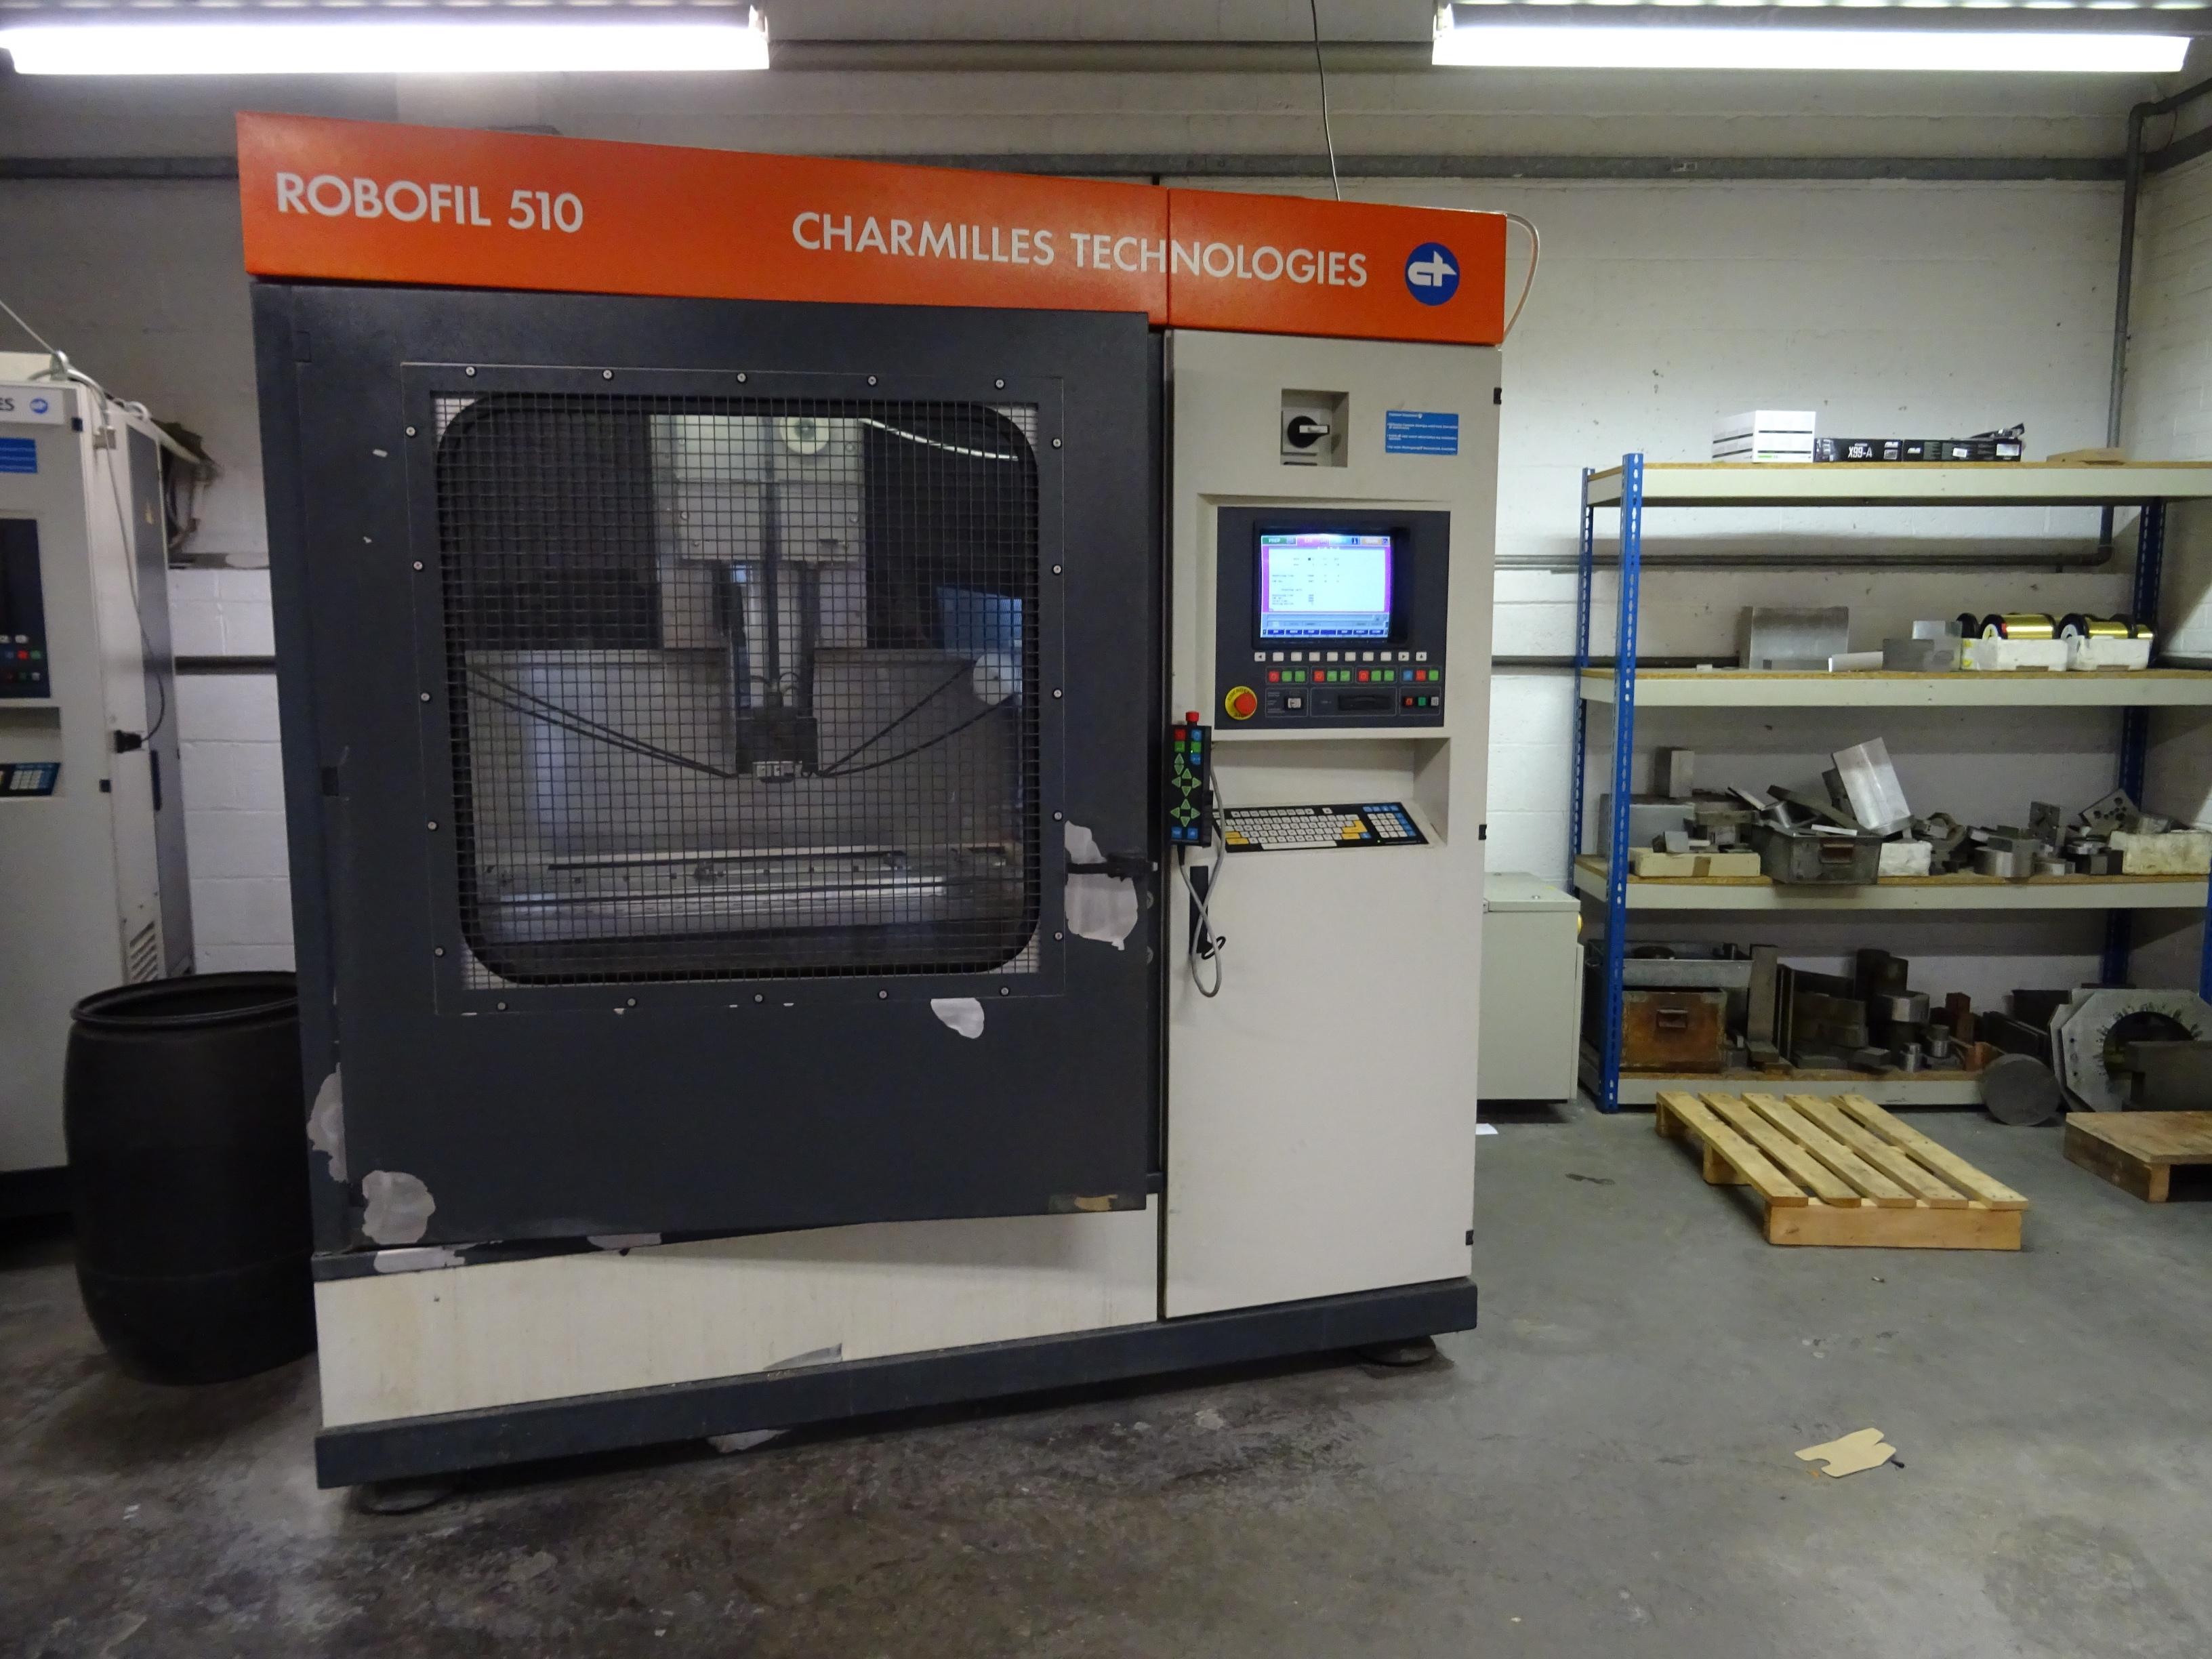 Charmilles Robofil 510 1st Machinery